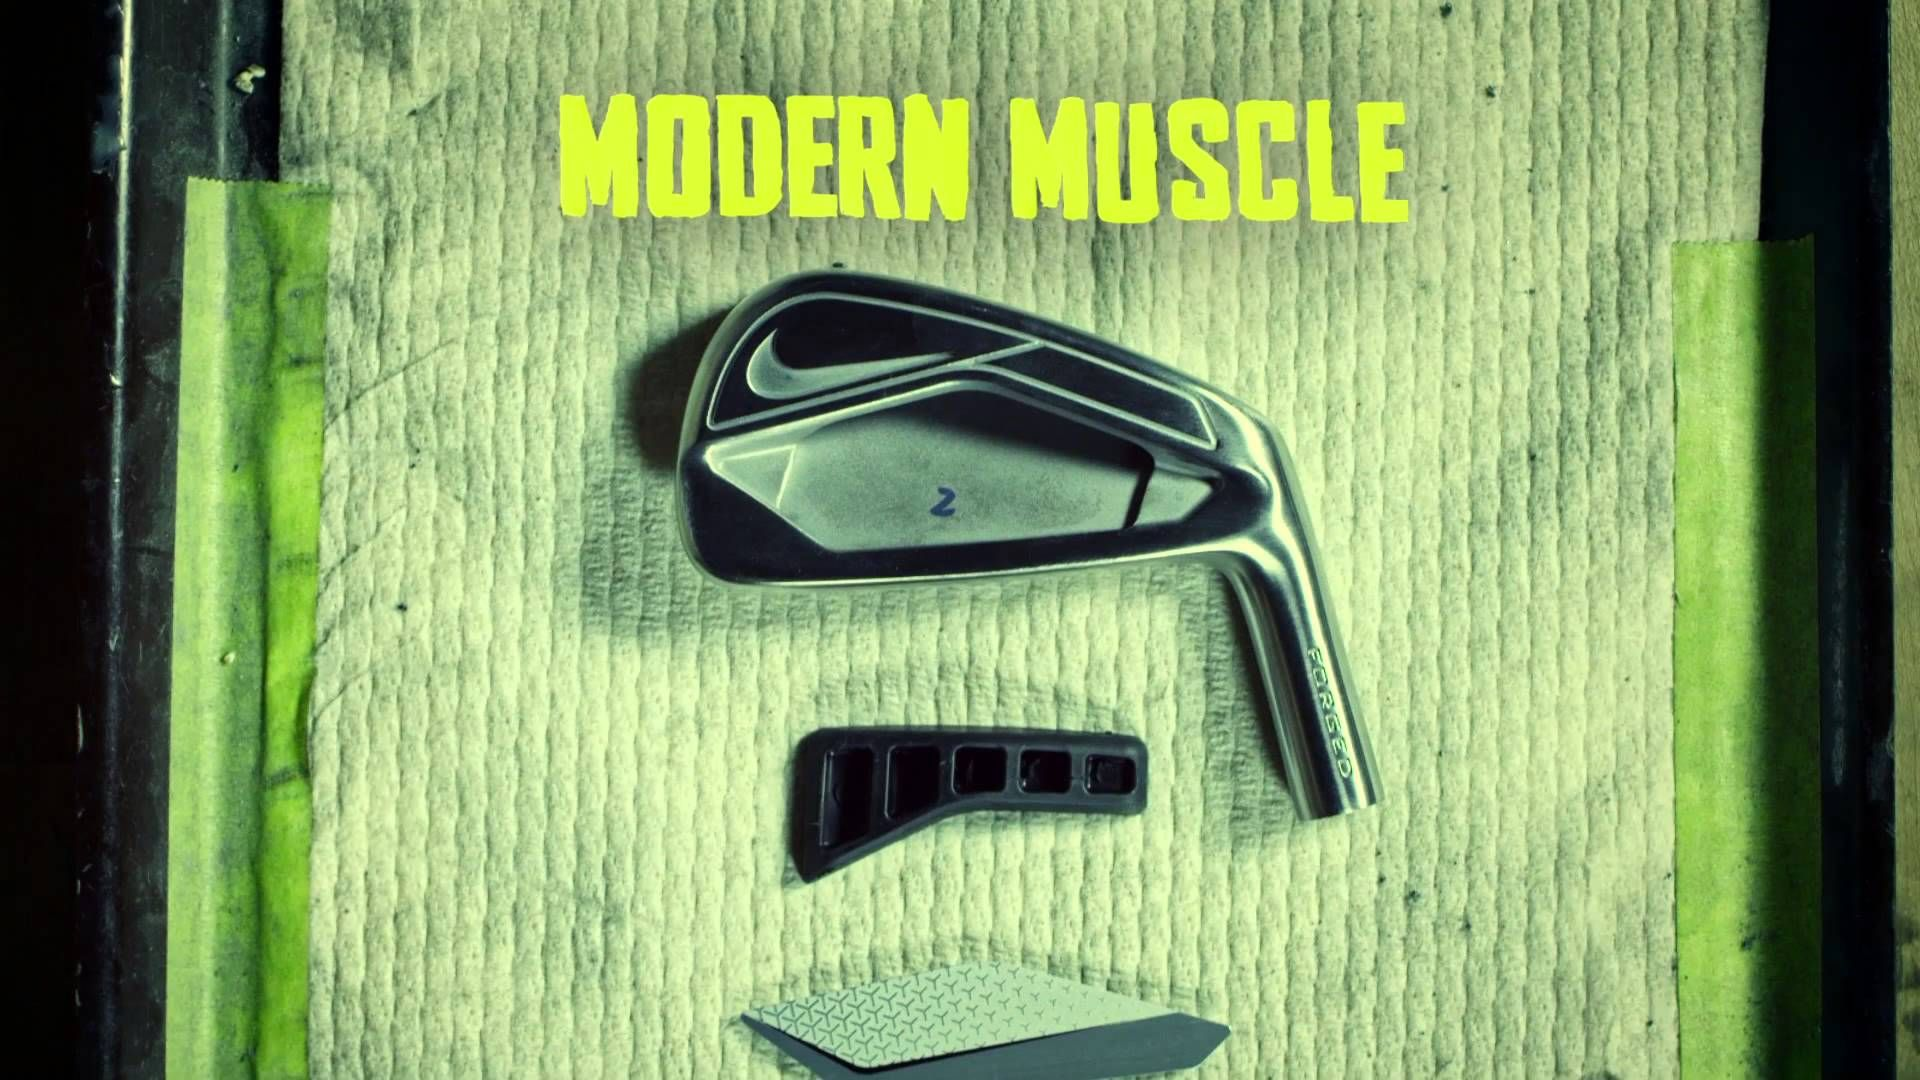 Antídoto yo mismo Fangoso  Nike Vapor Irons: The Modern Muscle